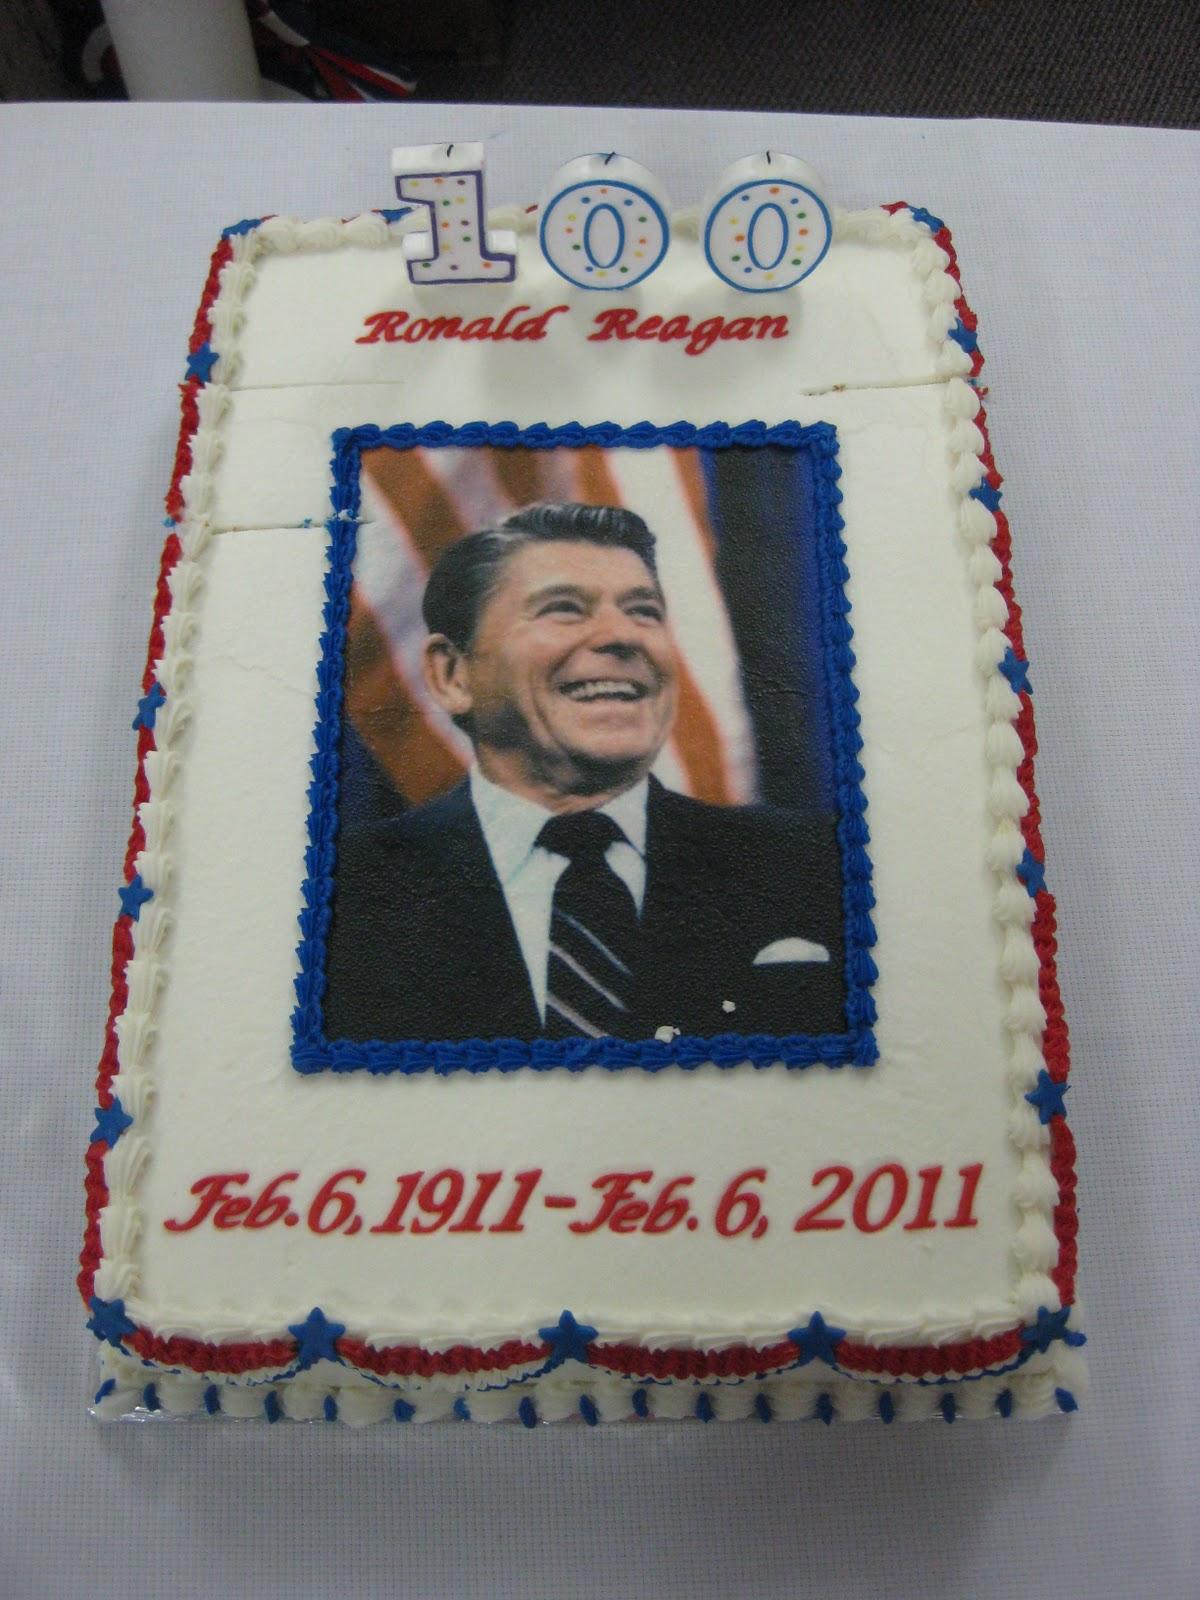 Birthday Cake Image For Ron : Marathon Pundit: Report from Tampico, Illinois on Reagan s ...